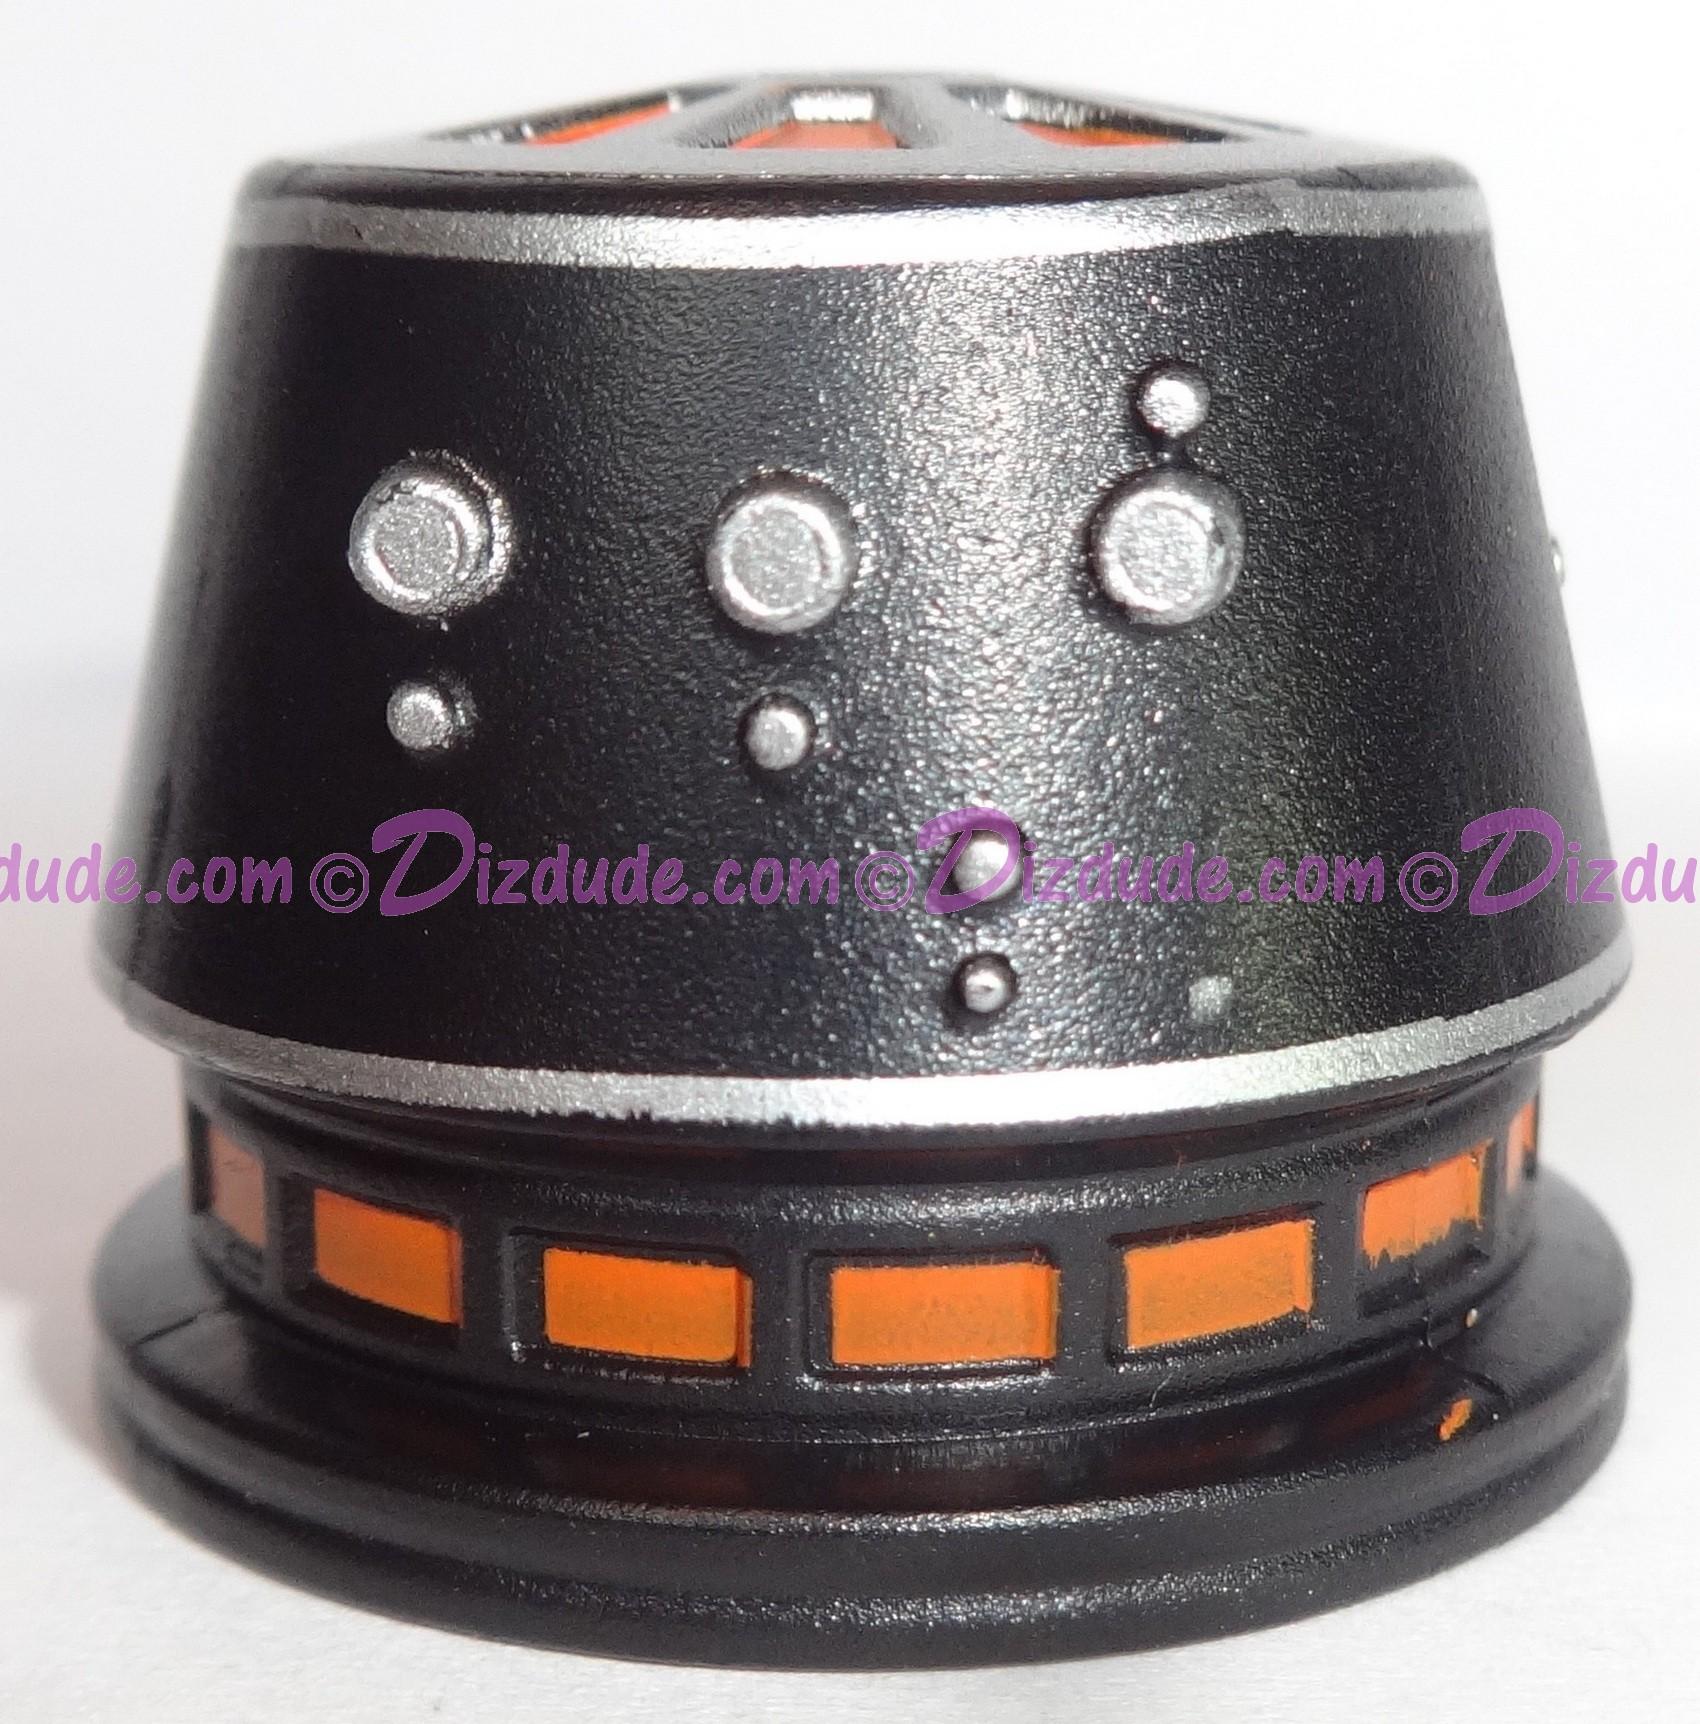 R5 Black Astromech Droid Dome ~ Series 2 from Disney Star Wars Build-A-Droid Factory © Dizdude.com